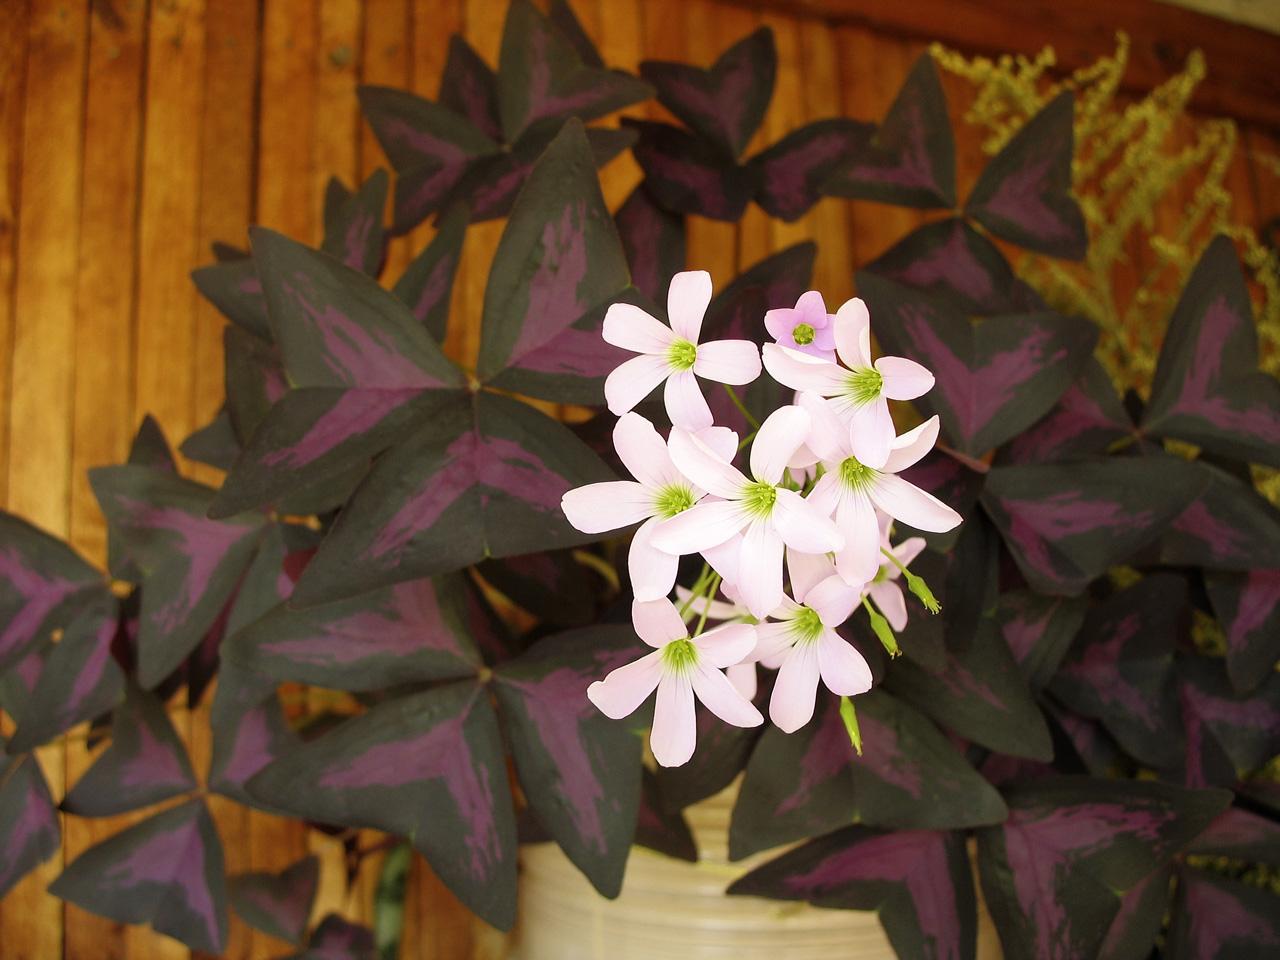 Цветок бабочка : уход, полив, фото, размножение и пересадка 96